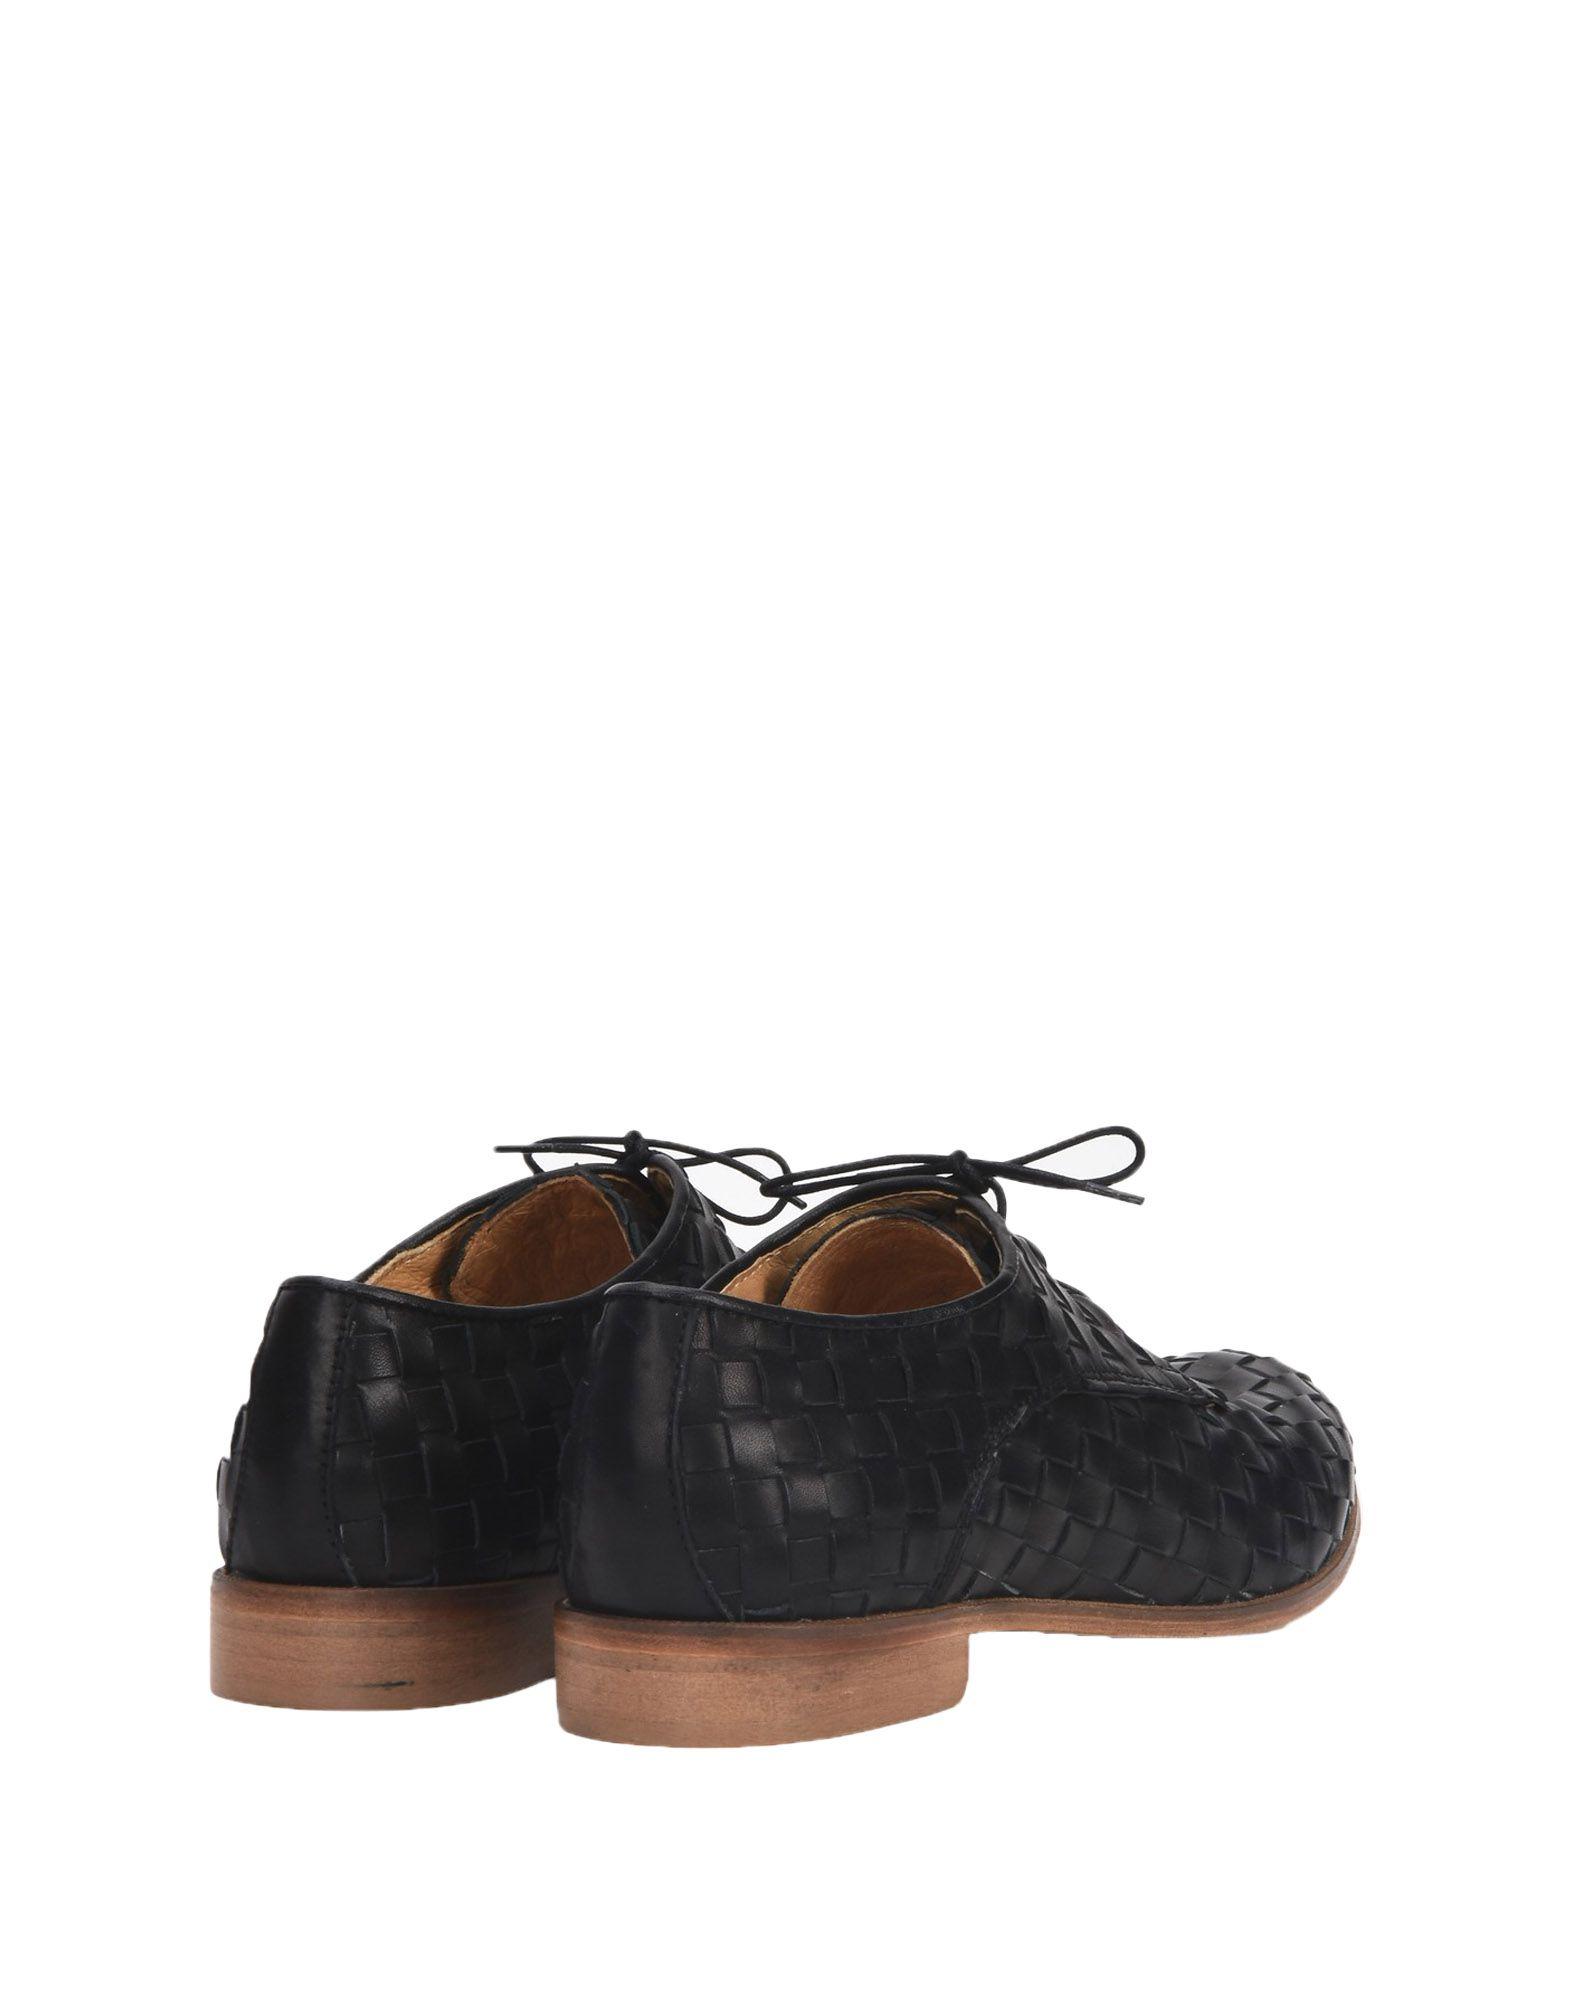 Leonardo Principi Schnürschuhe Damen  11230313GN Gute Qualität beliebte Schuhe